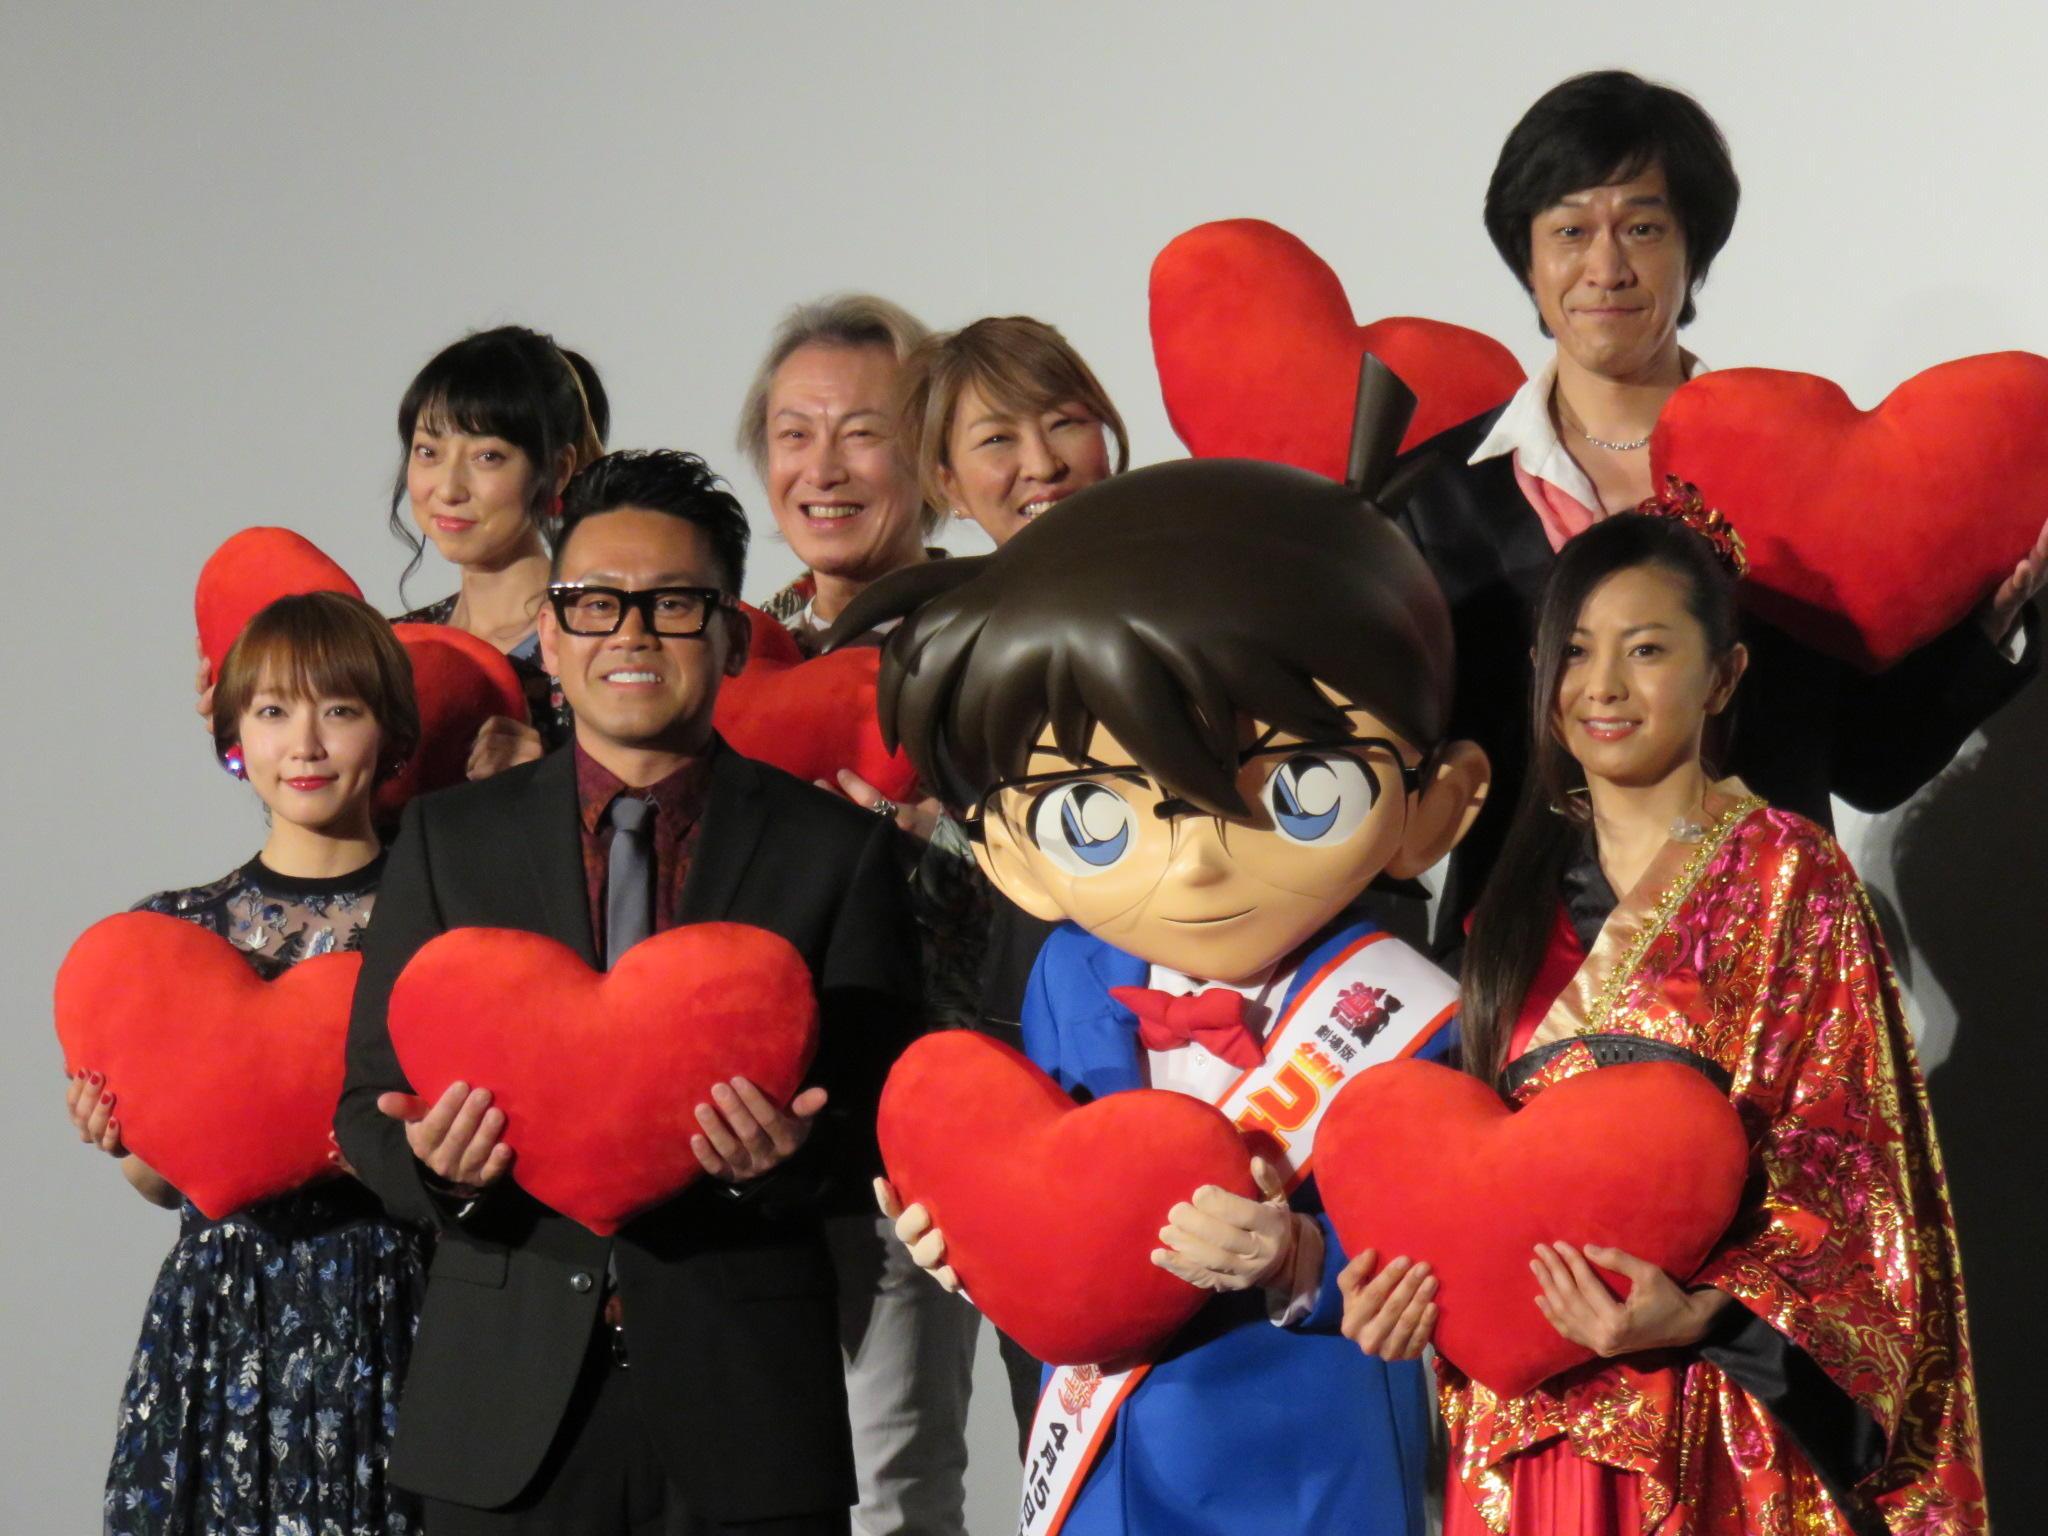 http://news.yoshimoto.co.jp/20170415182427-adc08dd31b839fec0696de9a7d9dc66079911c12.jpg